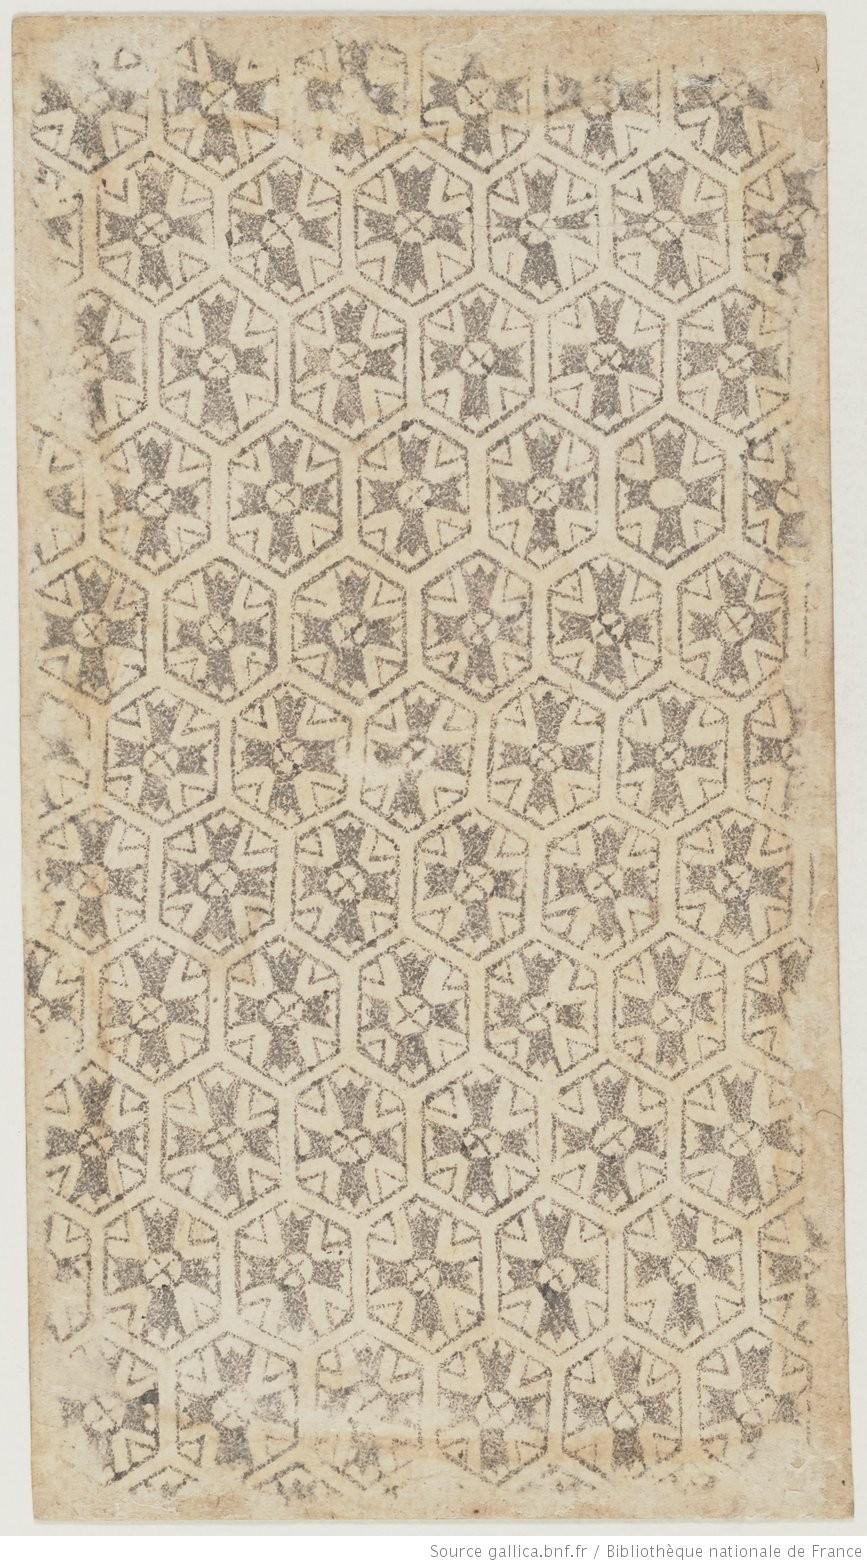 http://gallica.bnf.fr/ark:/12148/btv1b105109624/f2.highres